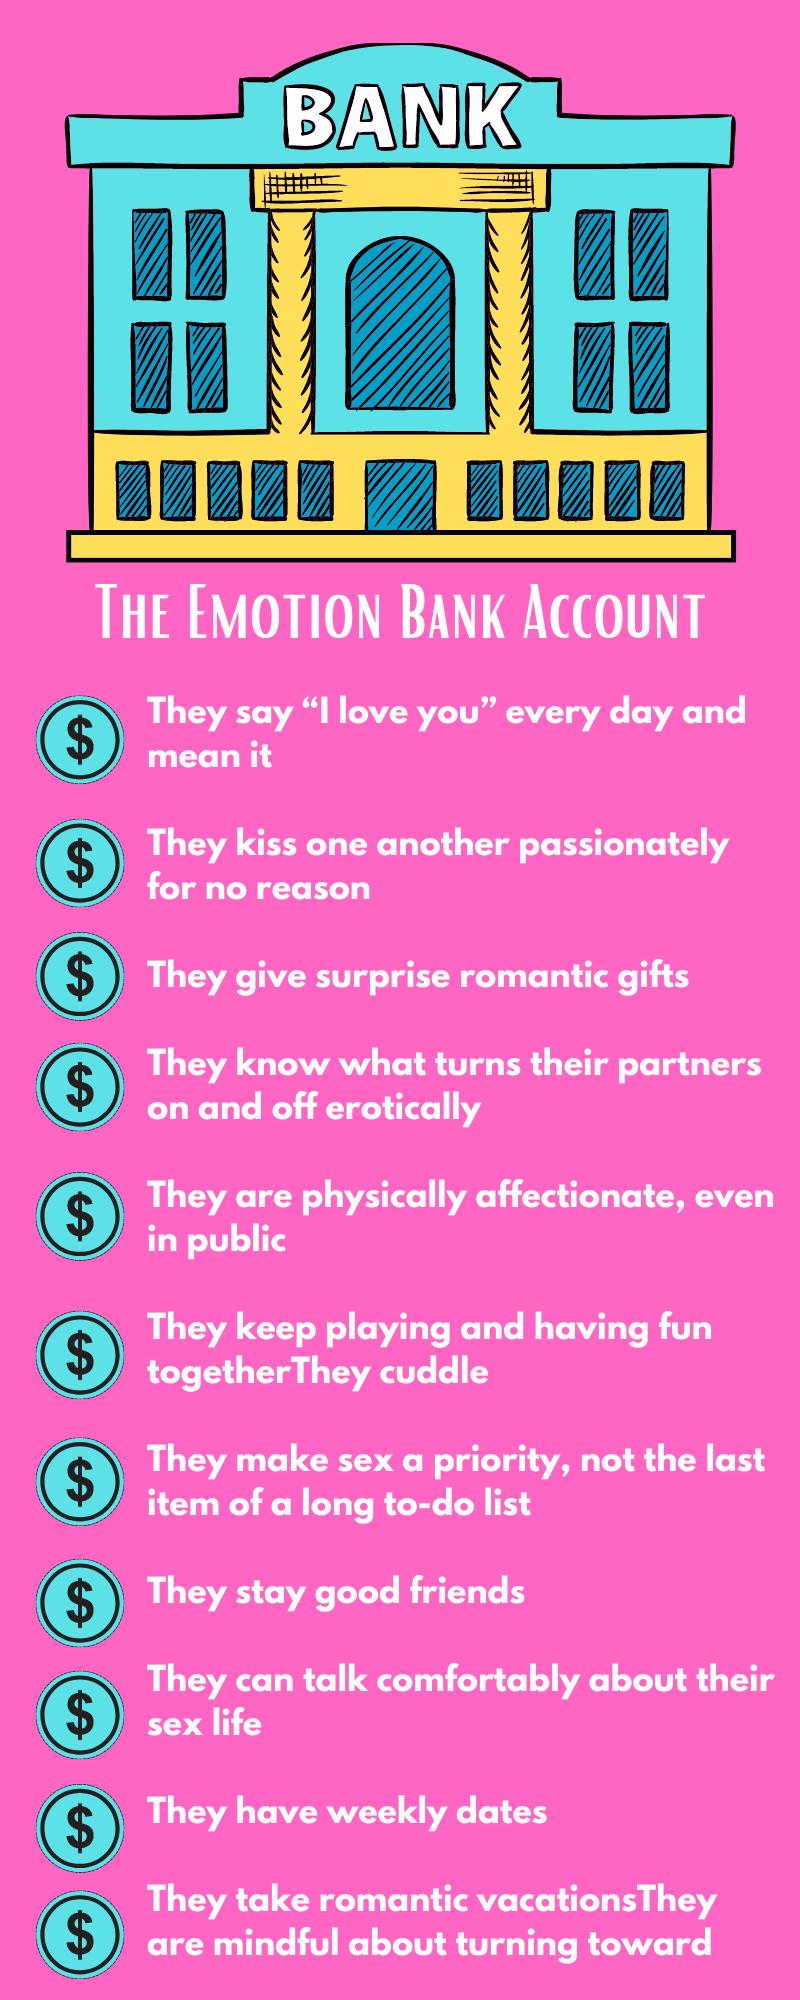 John Gottmans 13 emotional deposits into your spouse